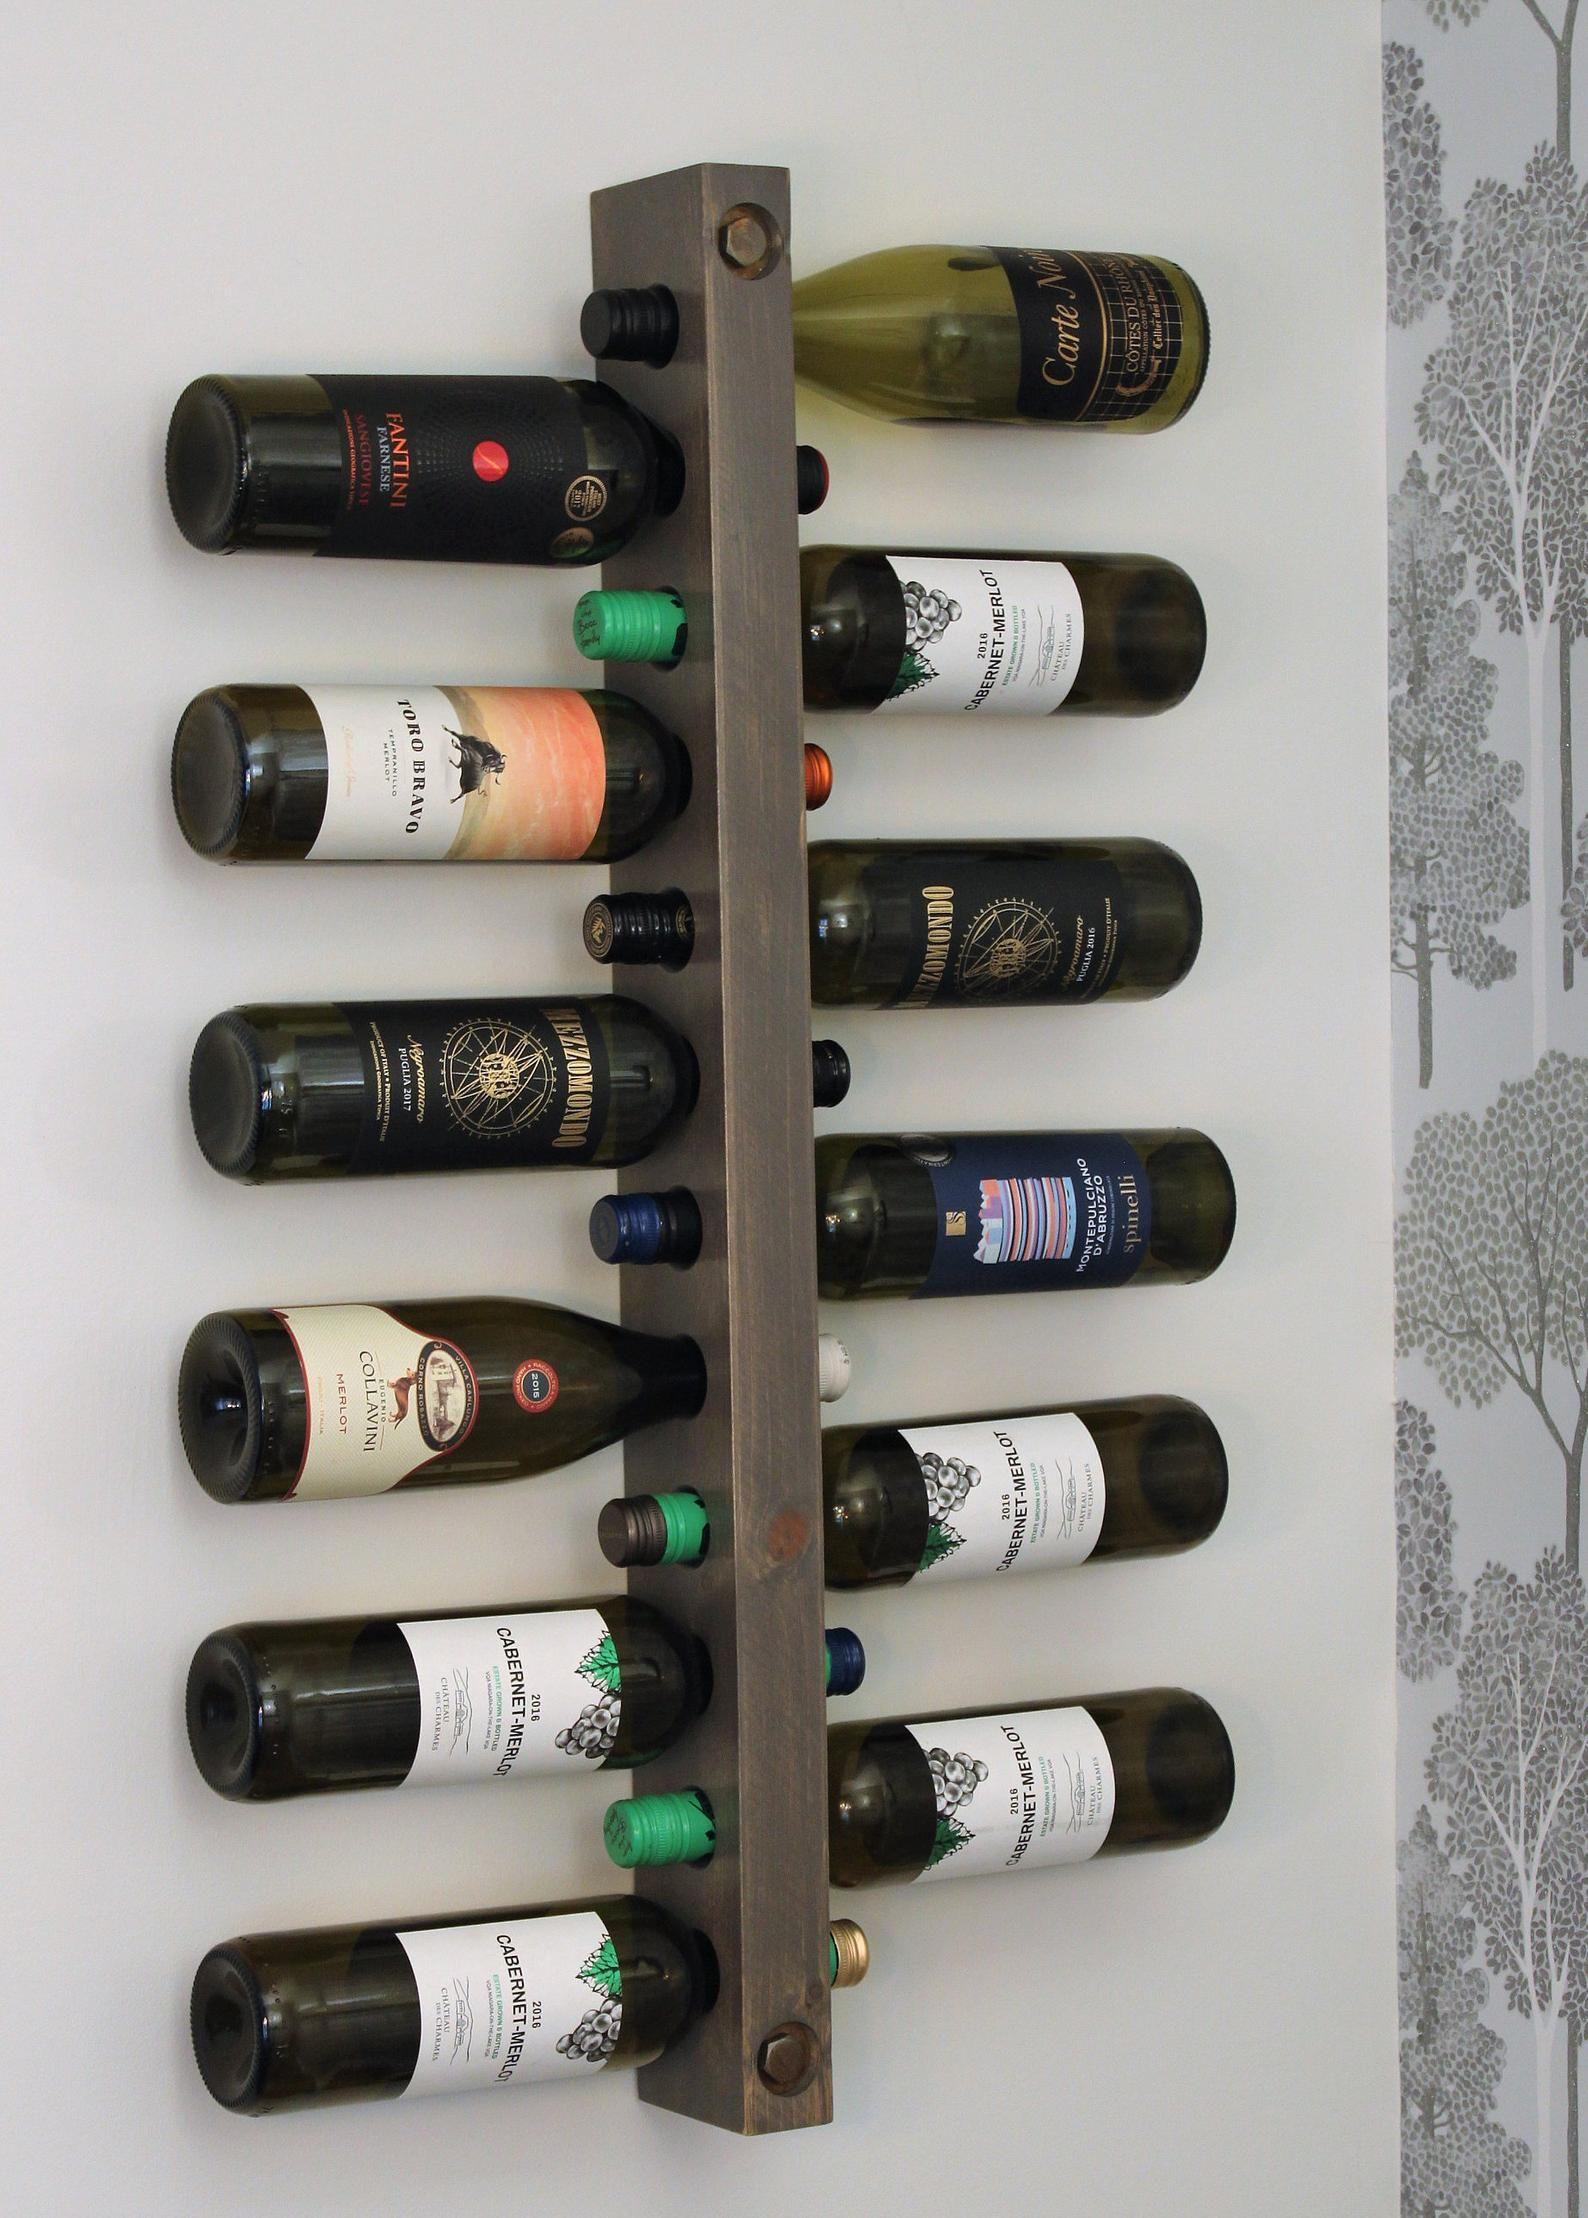 Wine Rack 12 Bottle Holder Wine Rack Wood Minimalist Wall Mounted Rustic Wine Rack Kitchen Wine Decor Housewarming Gift Christmas Gift In 2020 Wine Rack Wine Decor Kitchen Wine Rack Wall